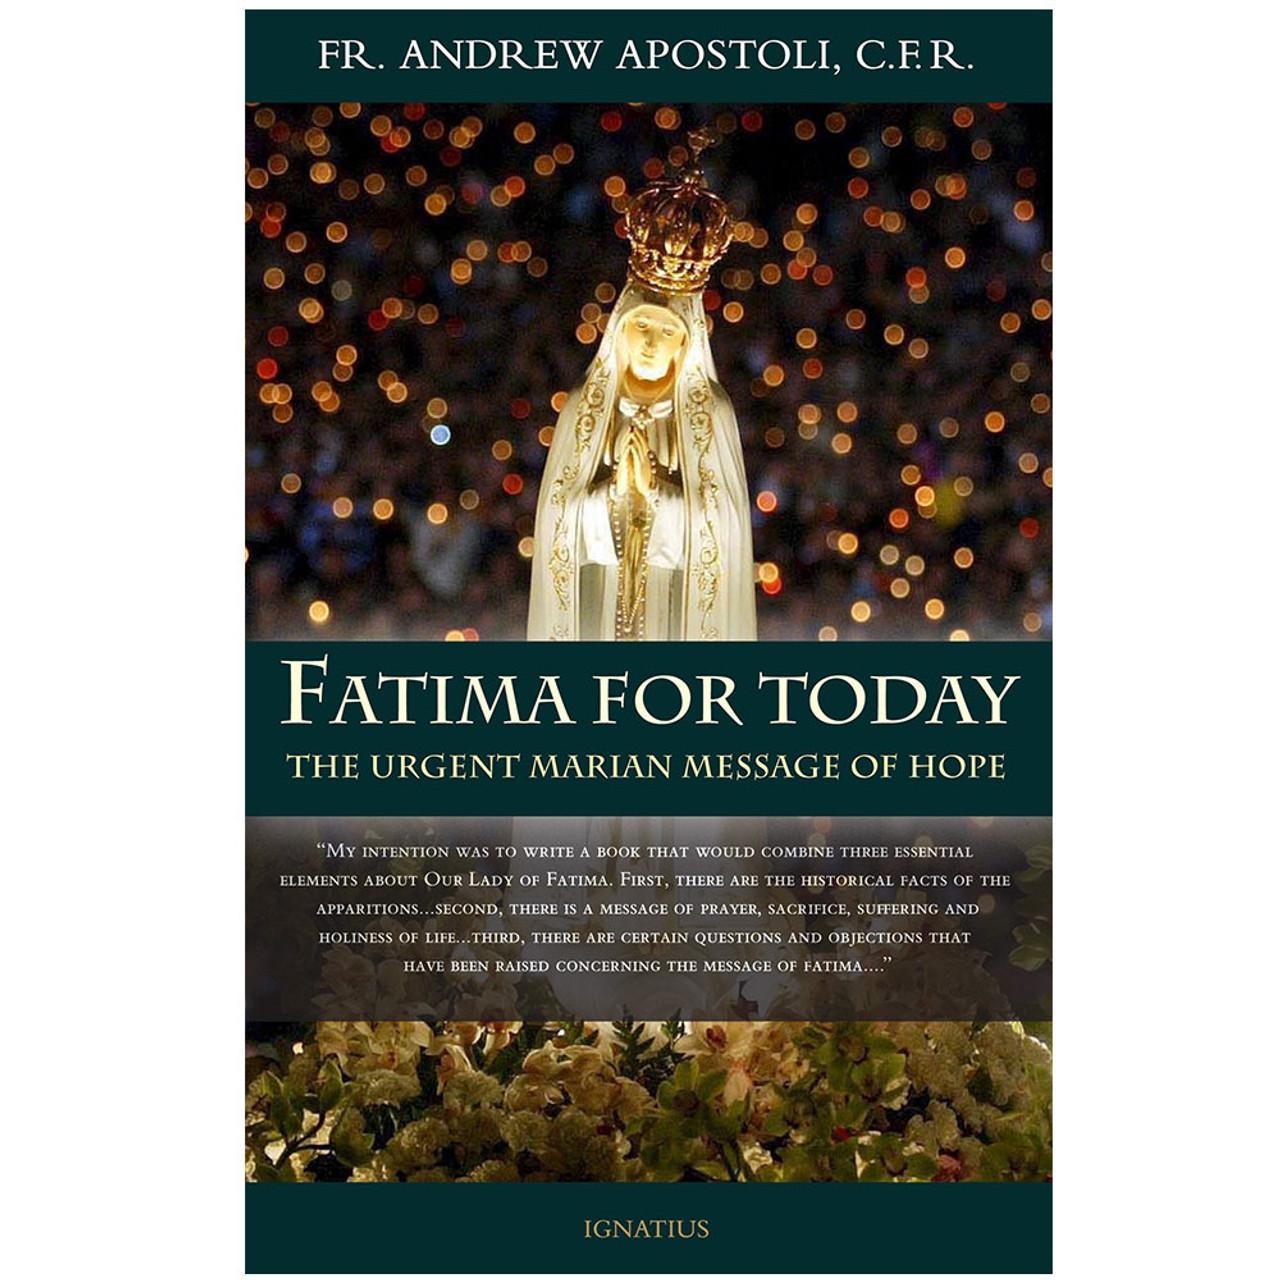 Fatima for Today Apostoli, Fr. Andrew